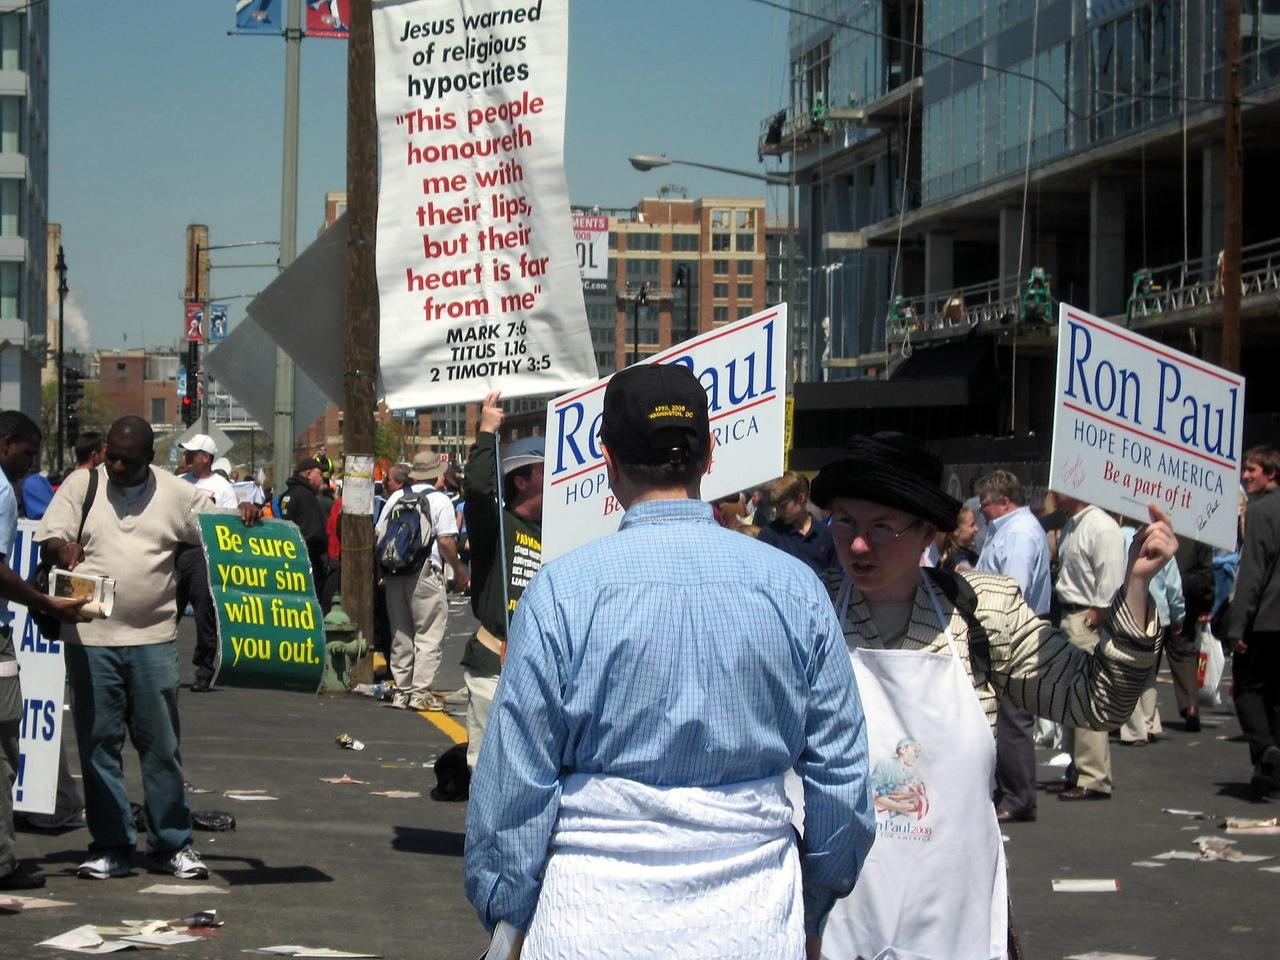 Demonstrators outside Nationals Park after the Mass